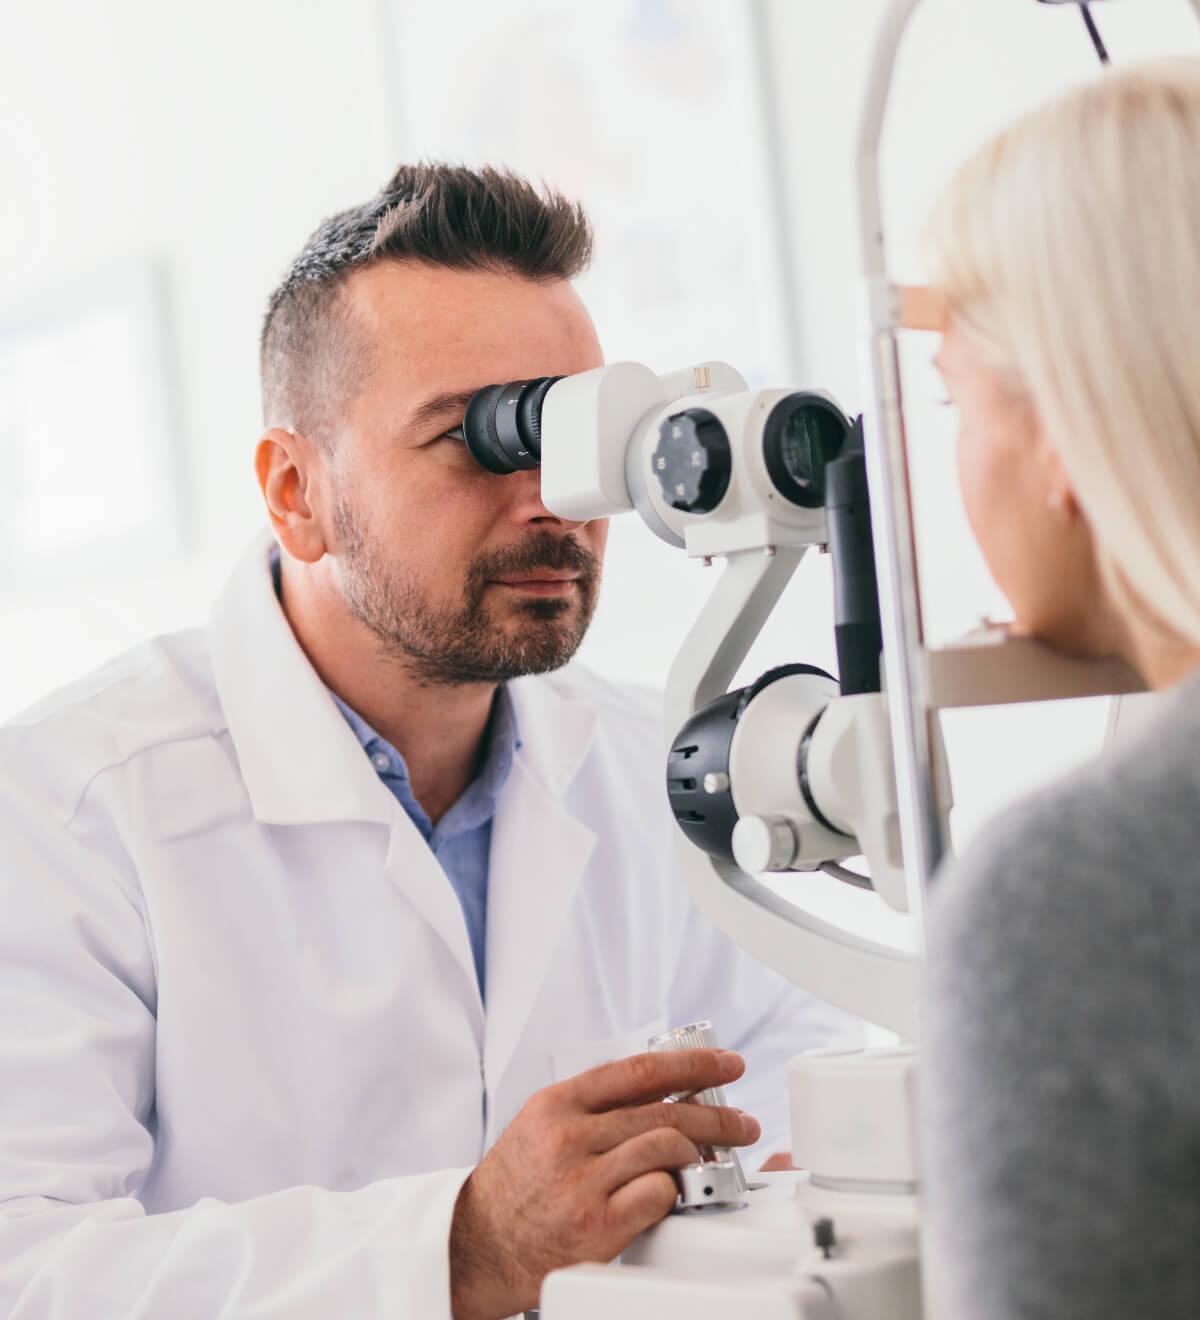 Young woman having an eye test